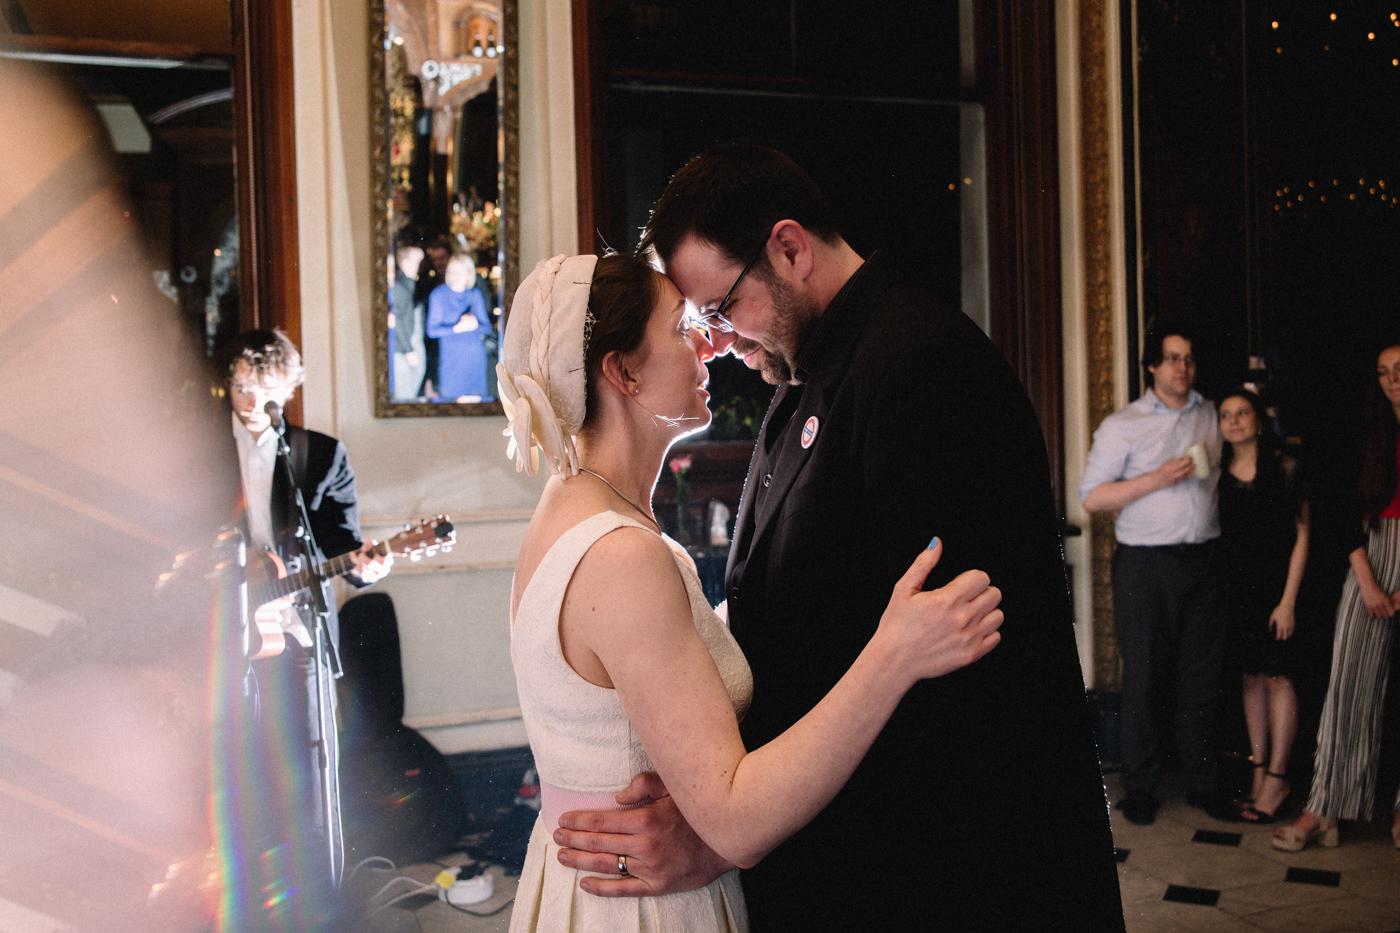 knights-templar-london-city-centre-wedding-photographer-charing-cross-creative-0041.jpg